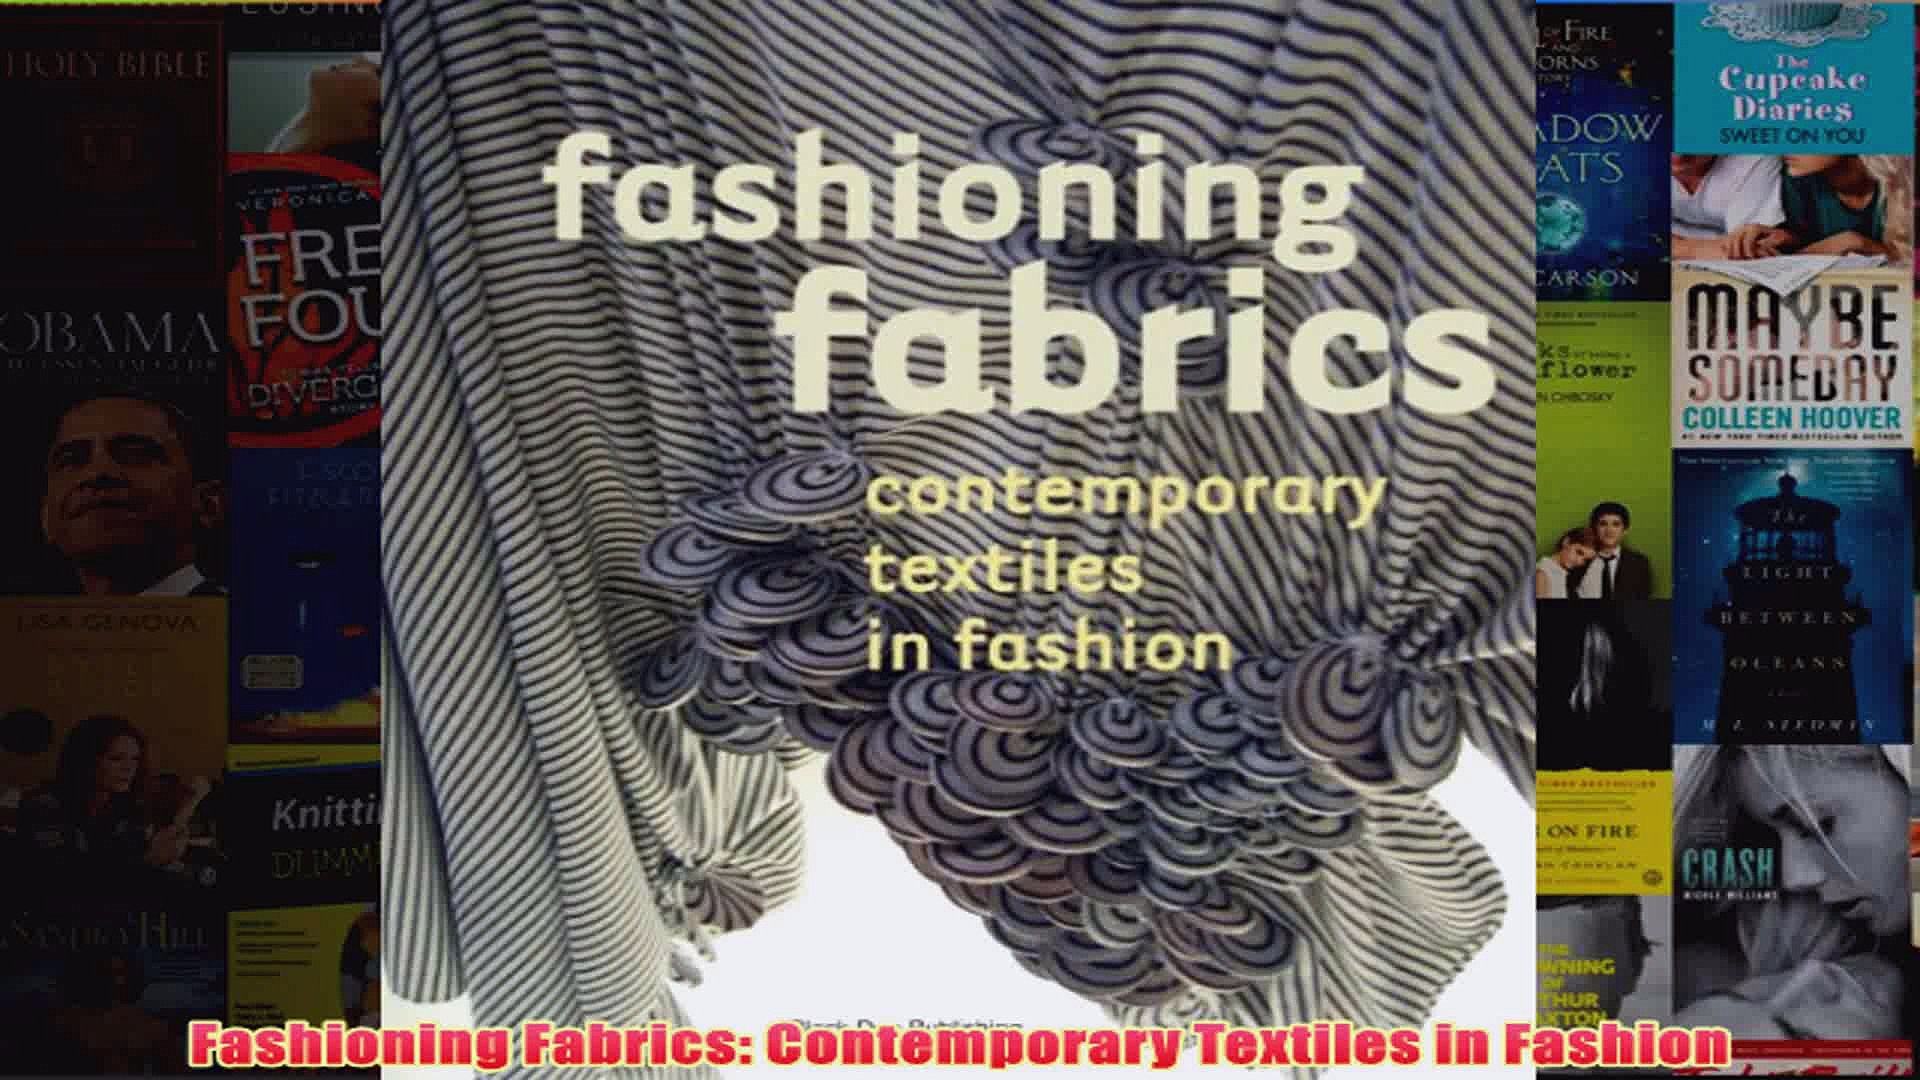 Fashioning Fabrics Contemporary Textiles in Fashion